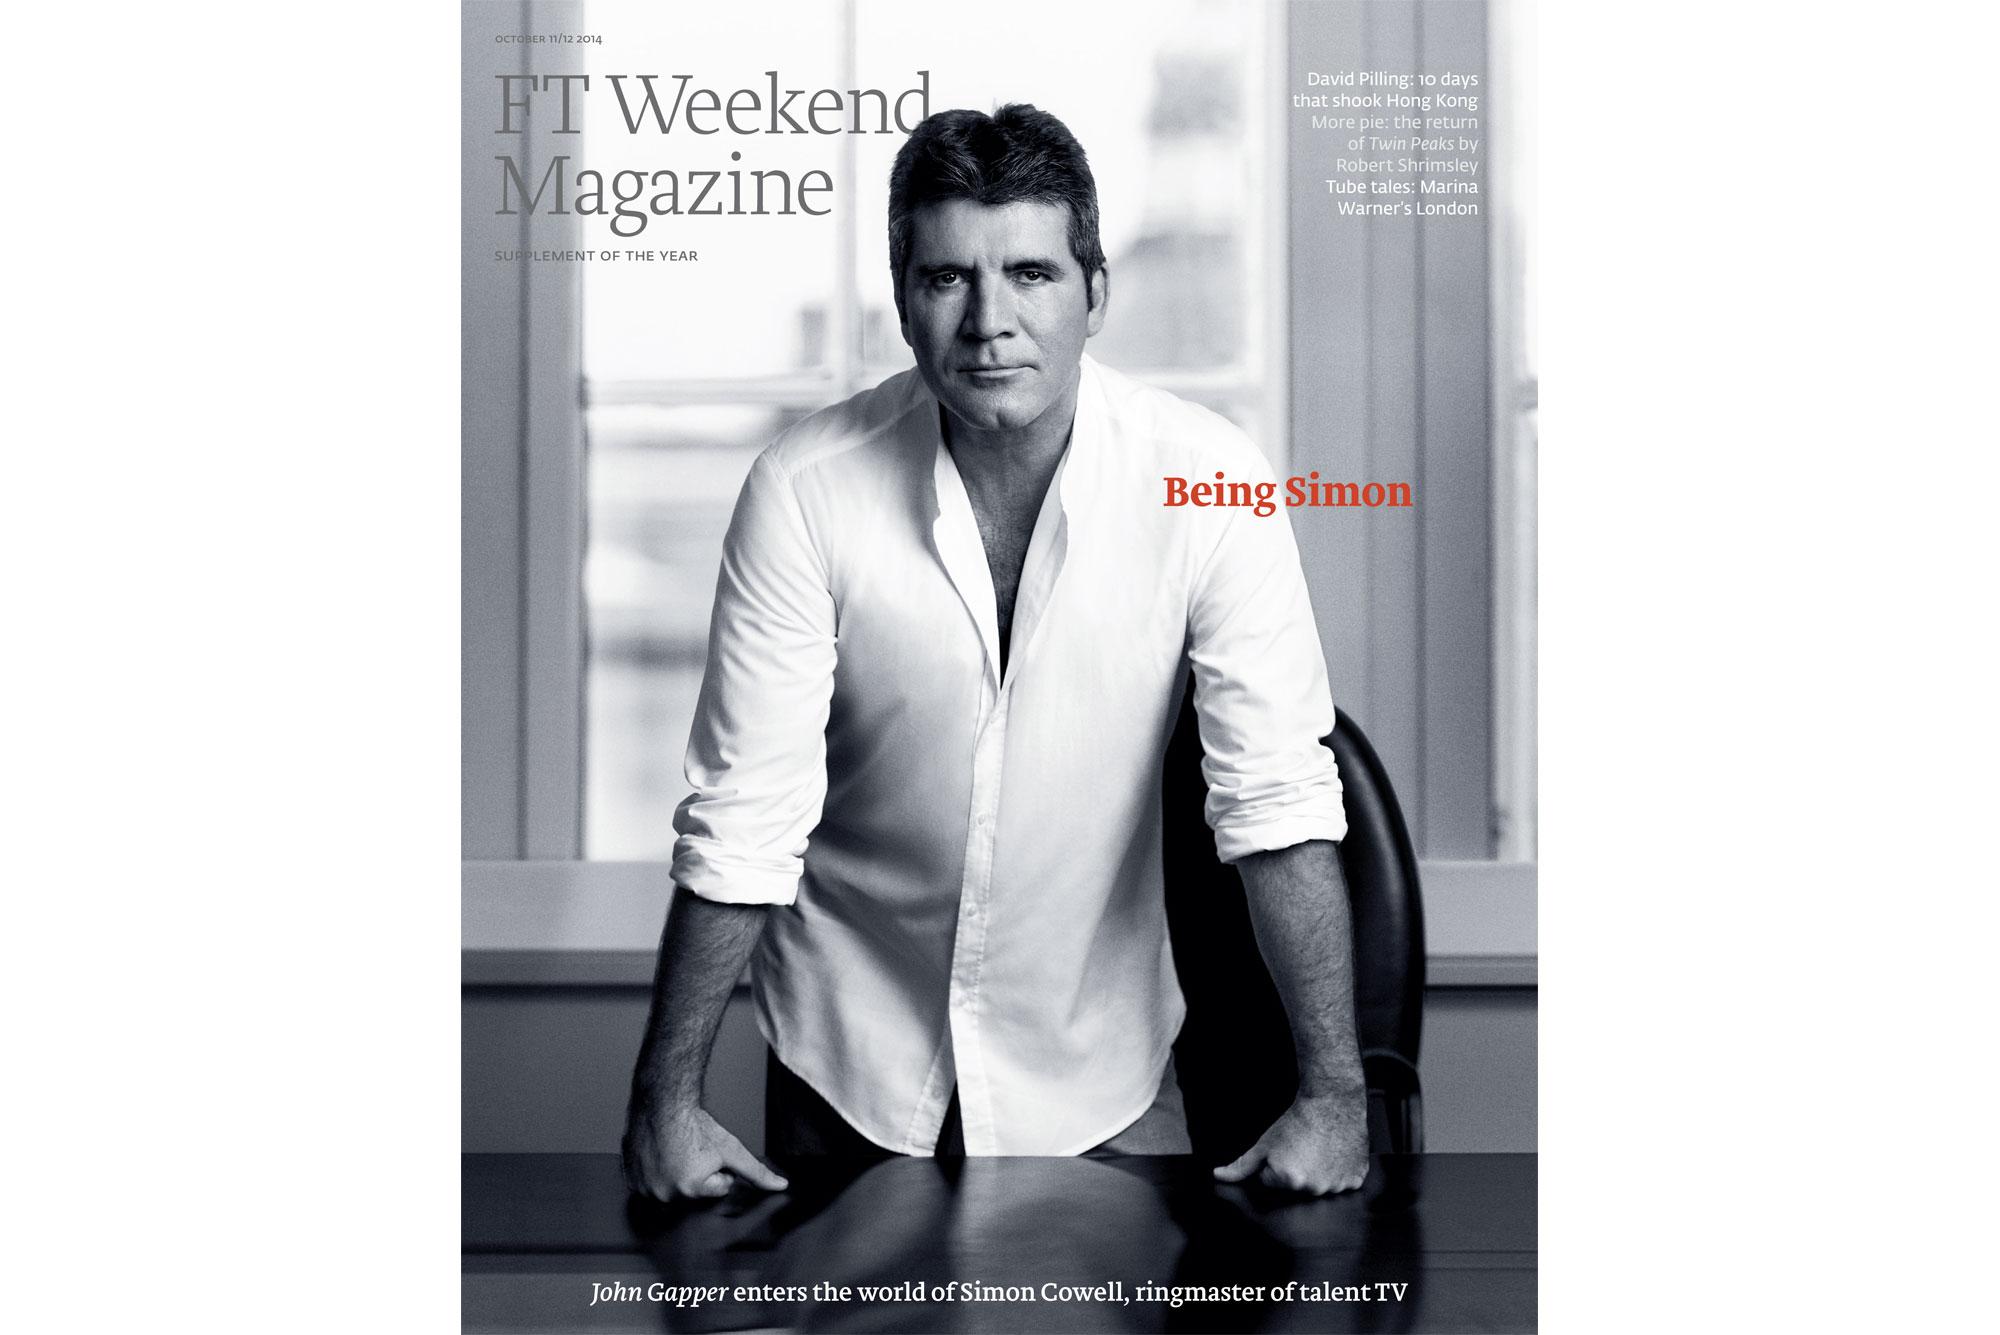 Simon Cowell FT Magazine cover